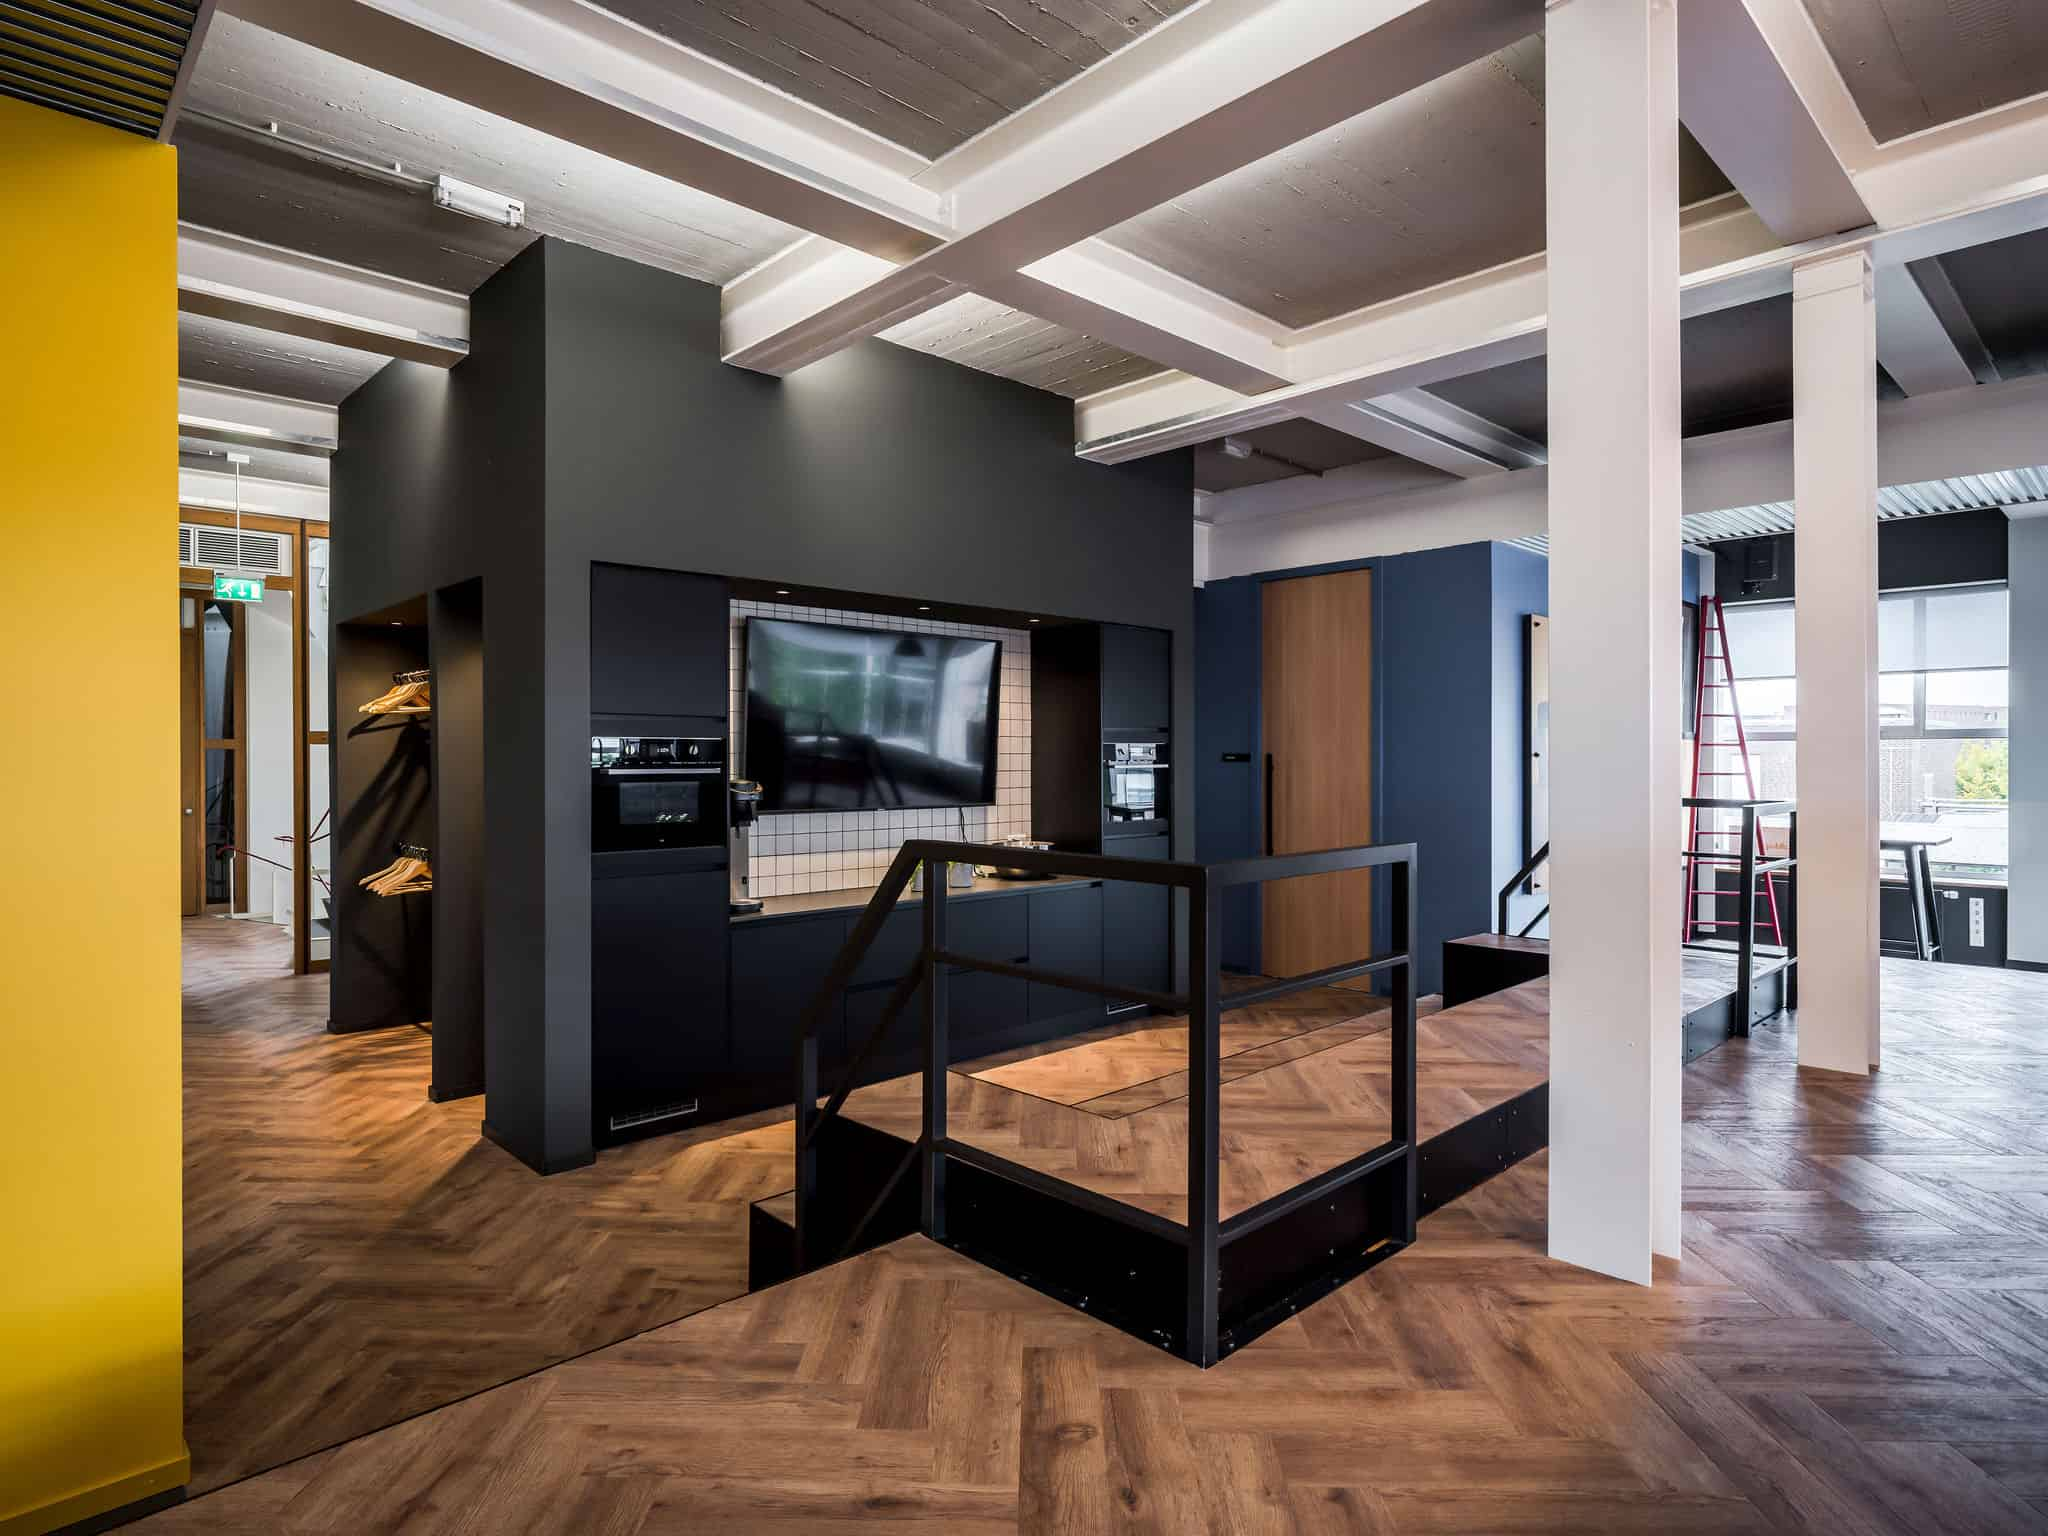 interieurarchitect ontwerpt kantoor aula Newpublic AEG